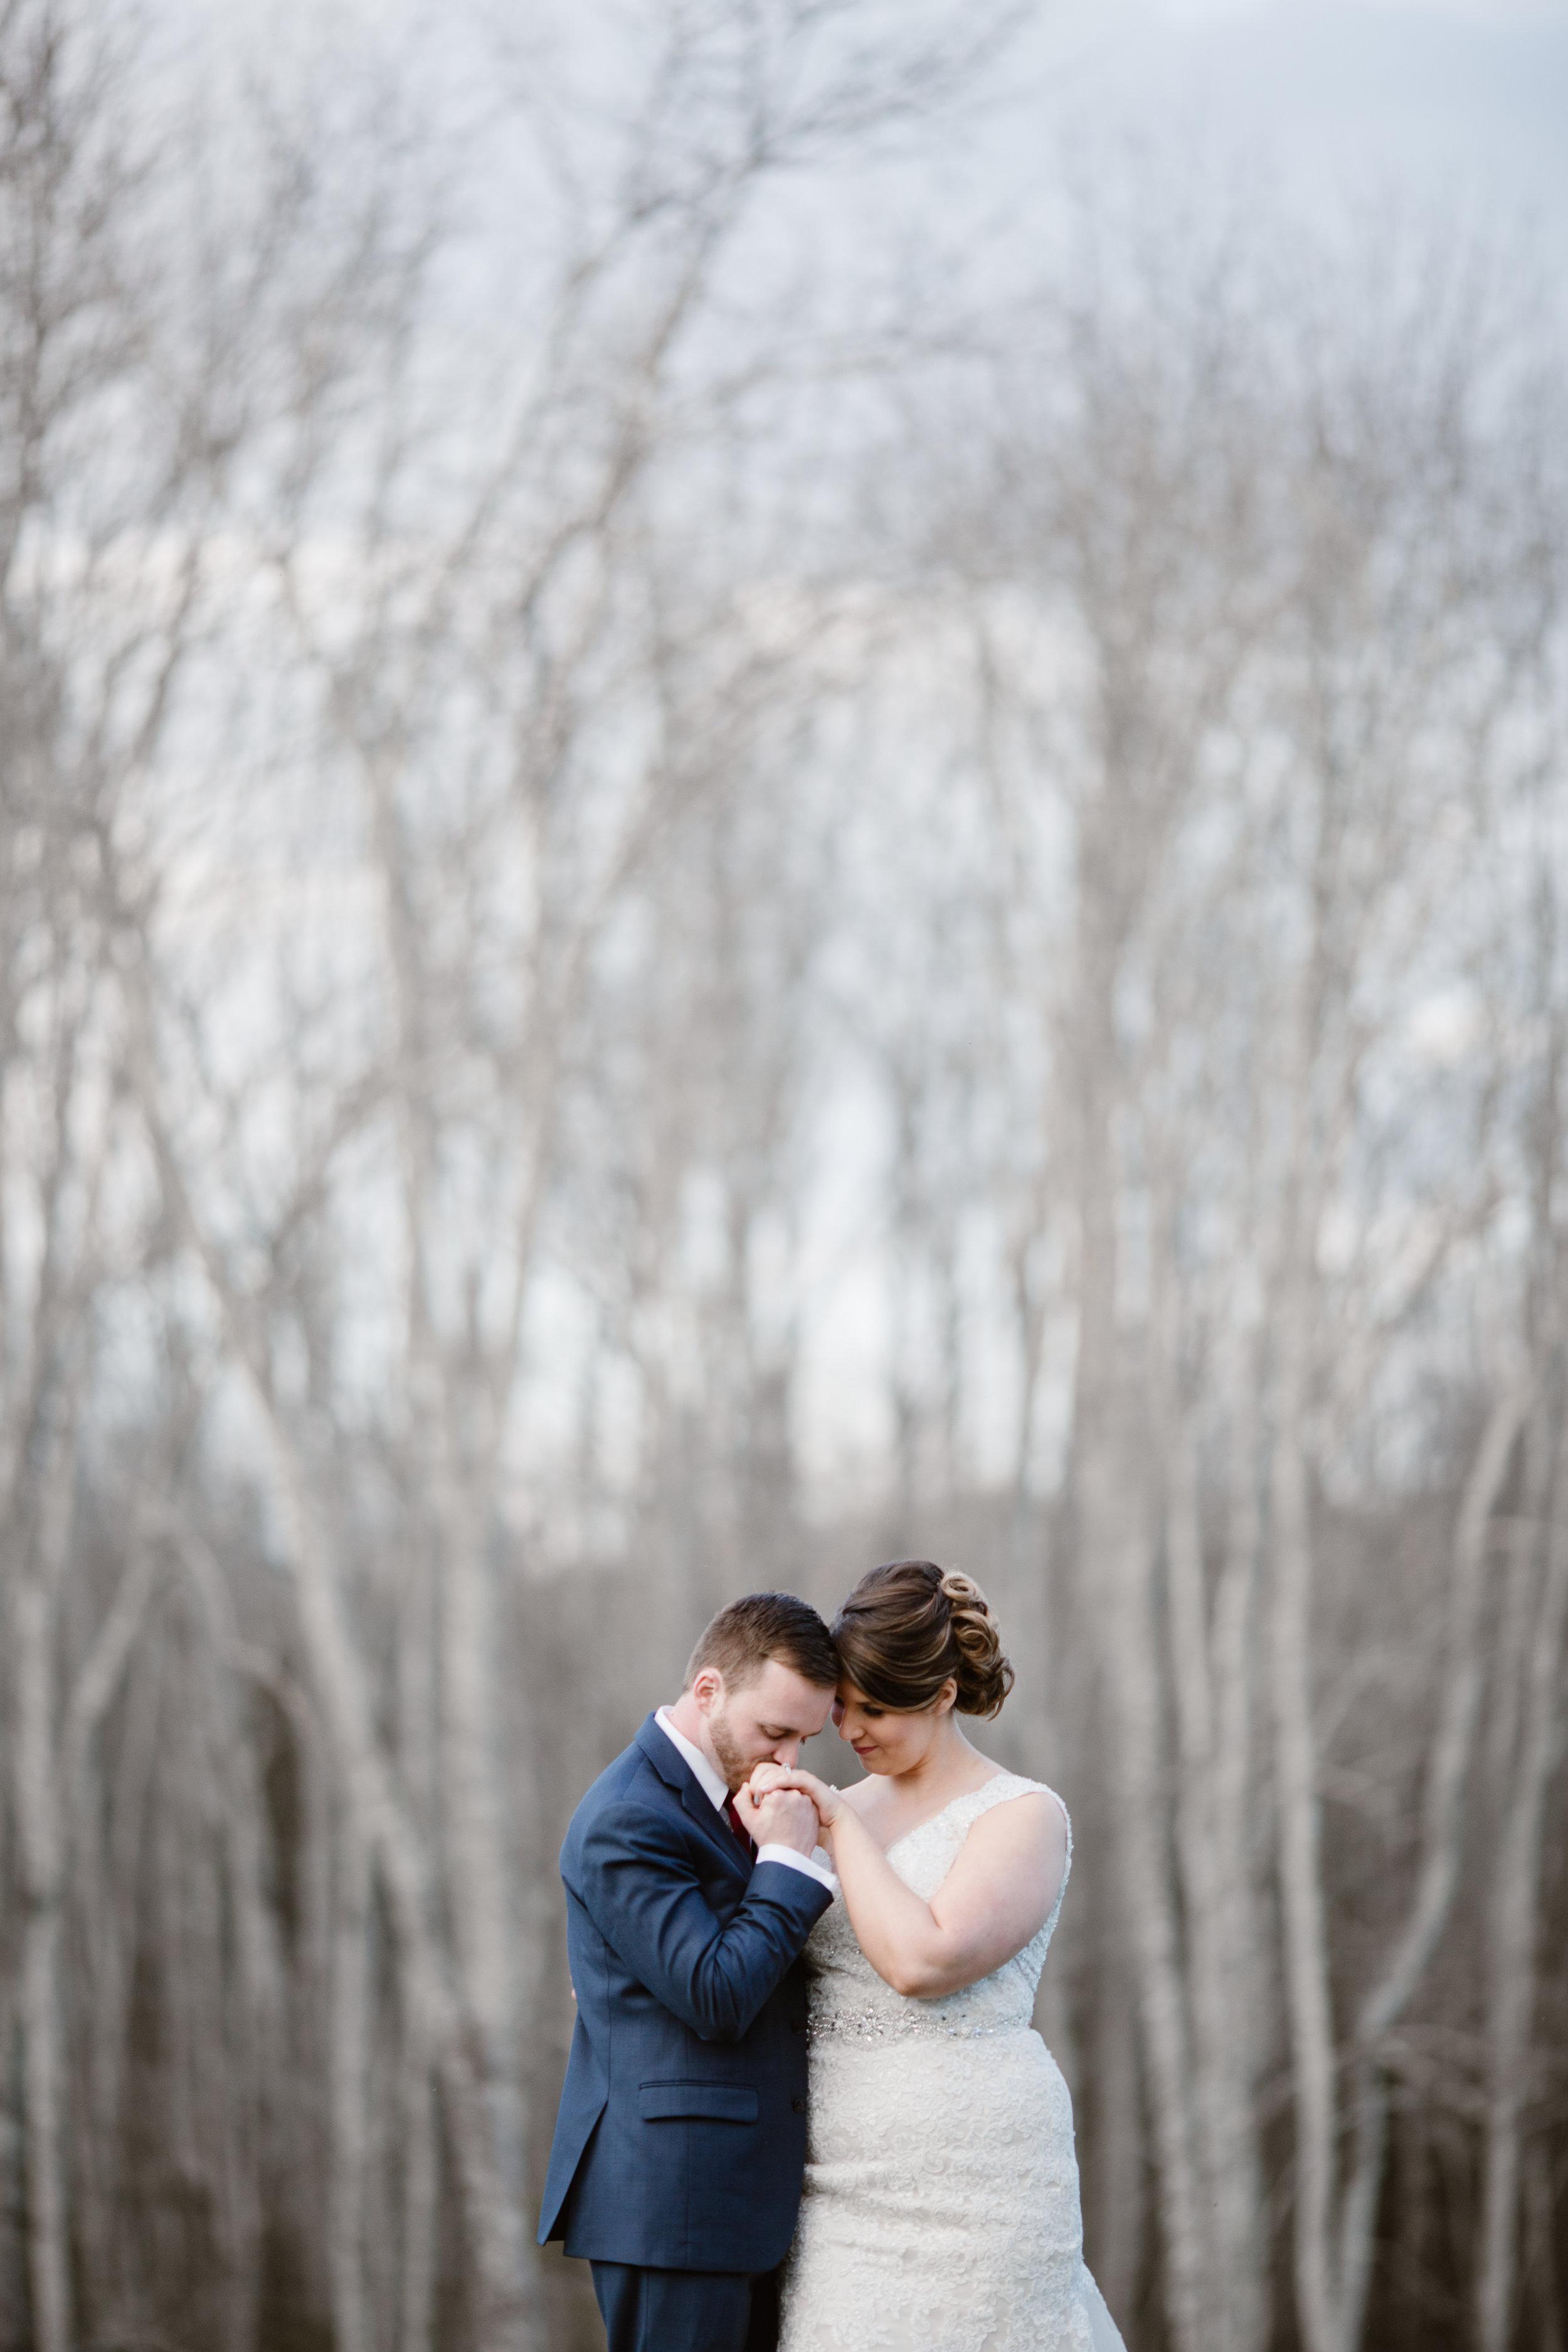 A Burgundy + Bronze Ramble Creek Fall Wedding - Erin Morrison Photography